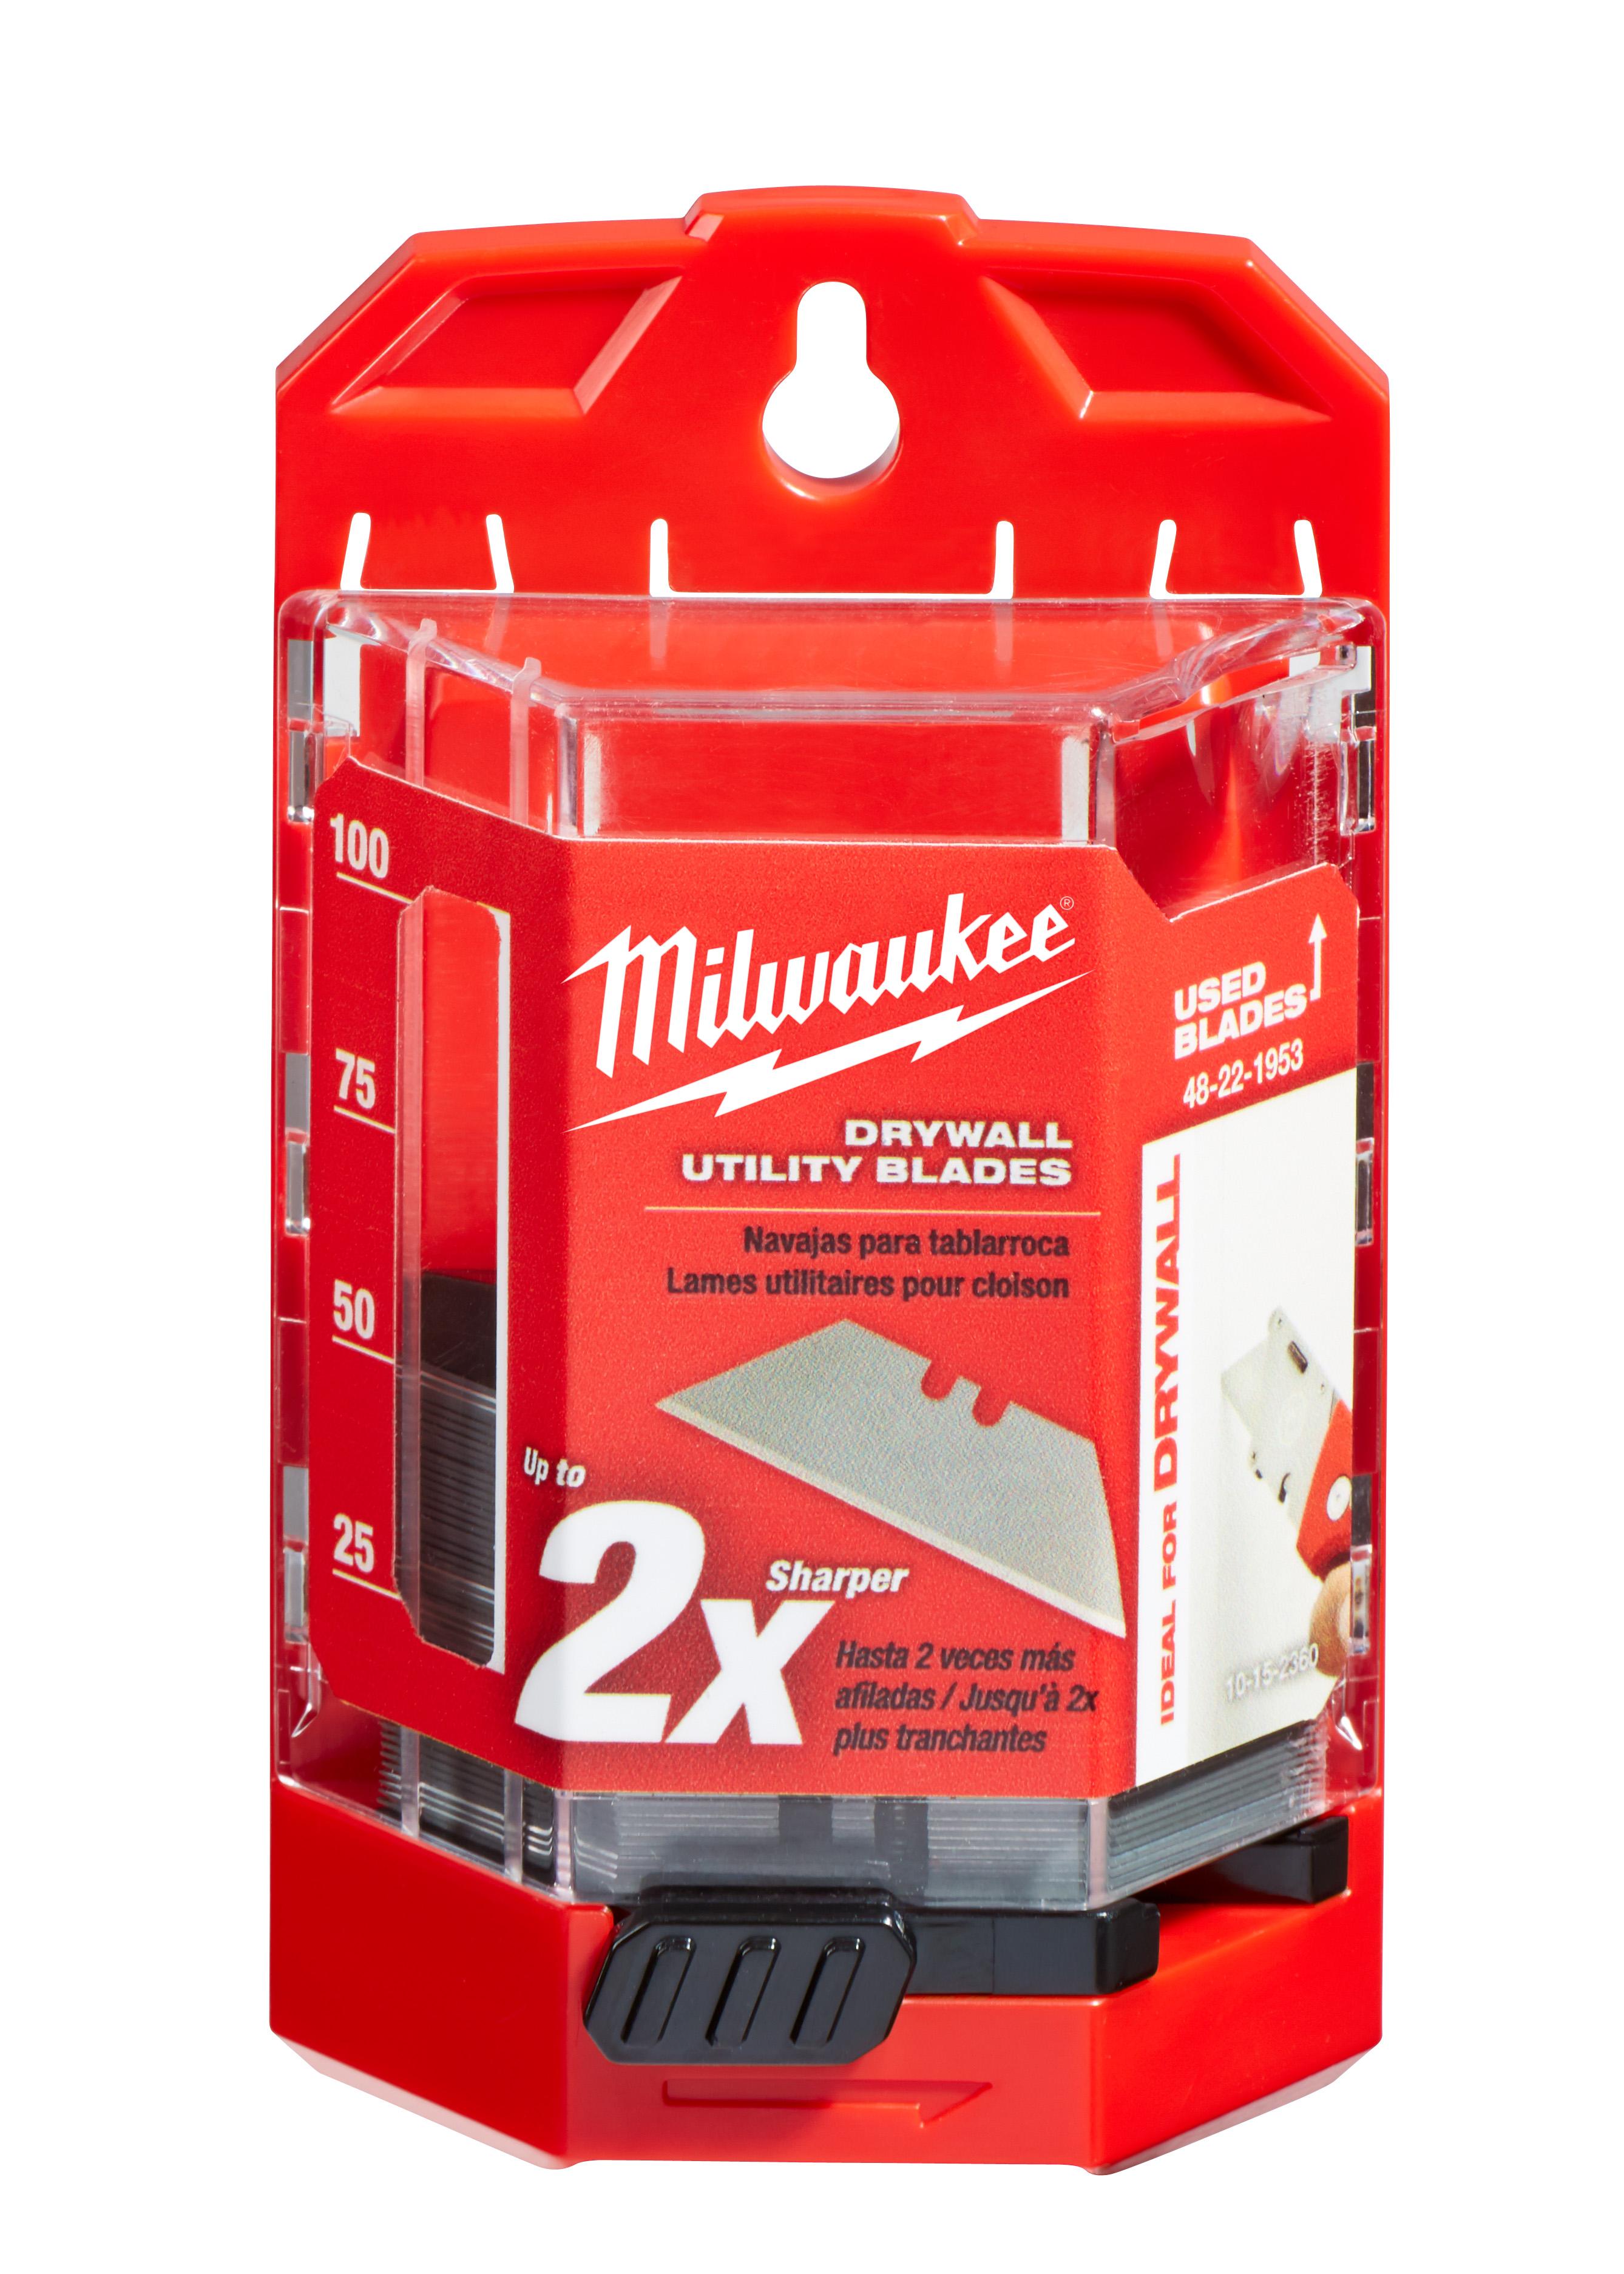 Milwaukee 48-22-1953 50-Piece Drywall Utility Knife Blades w/ Dispenser